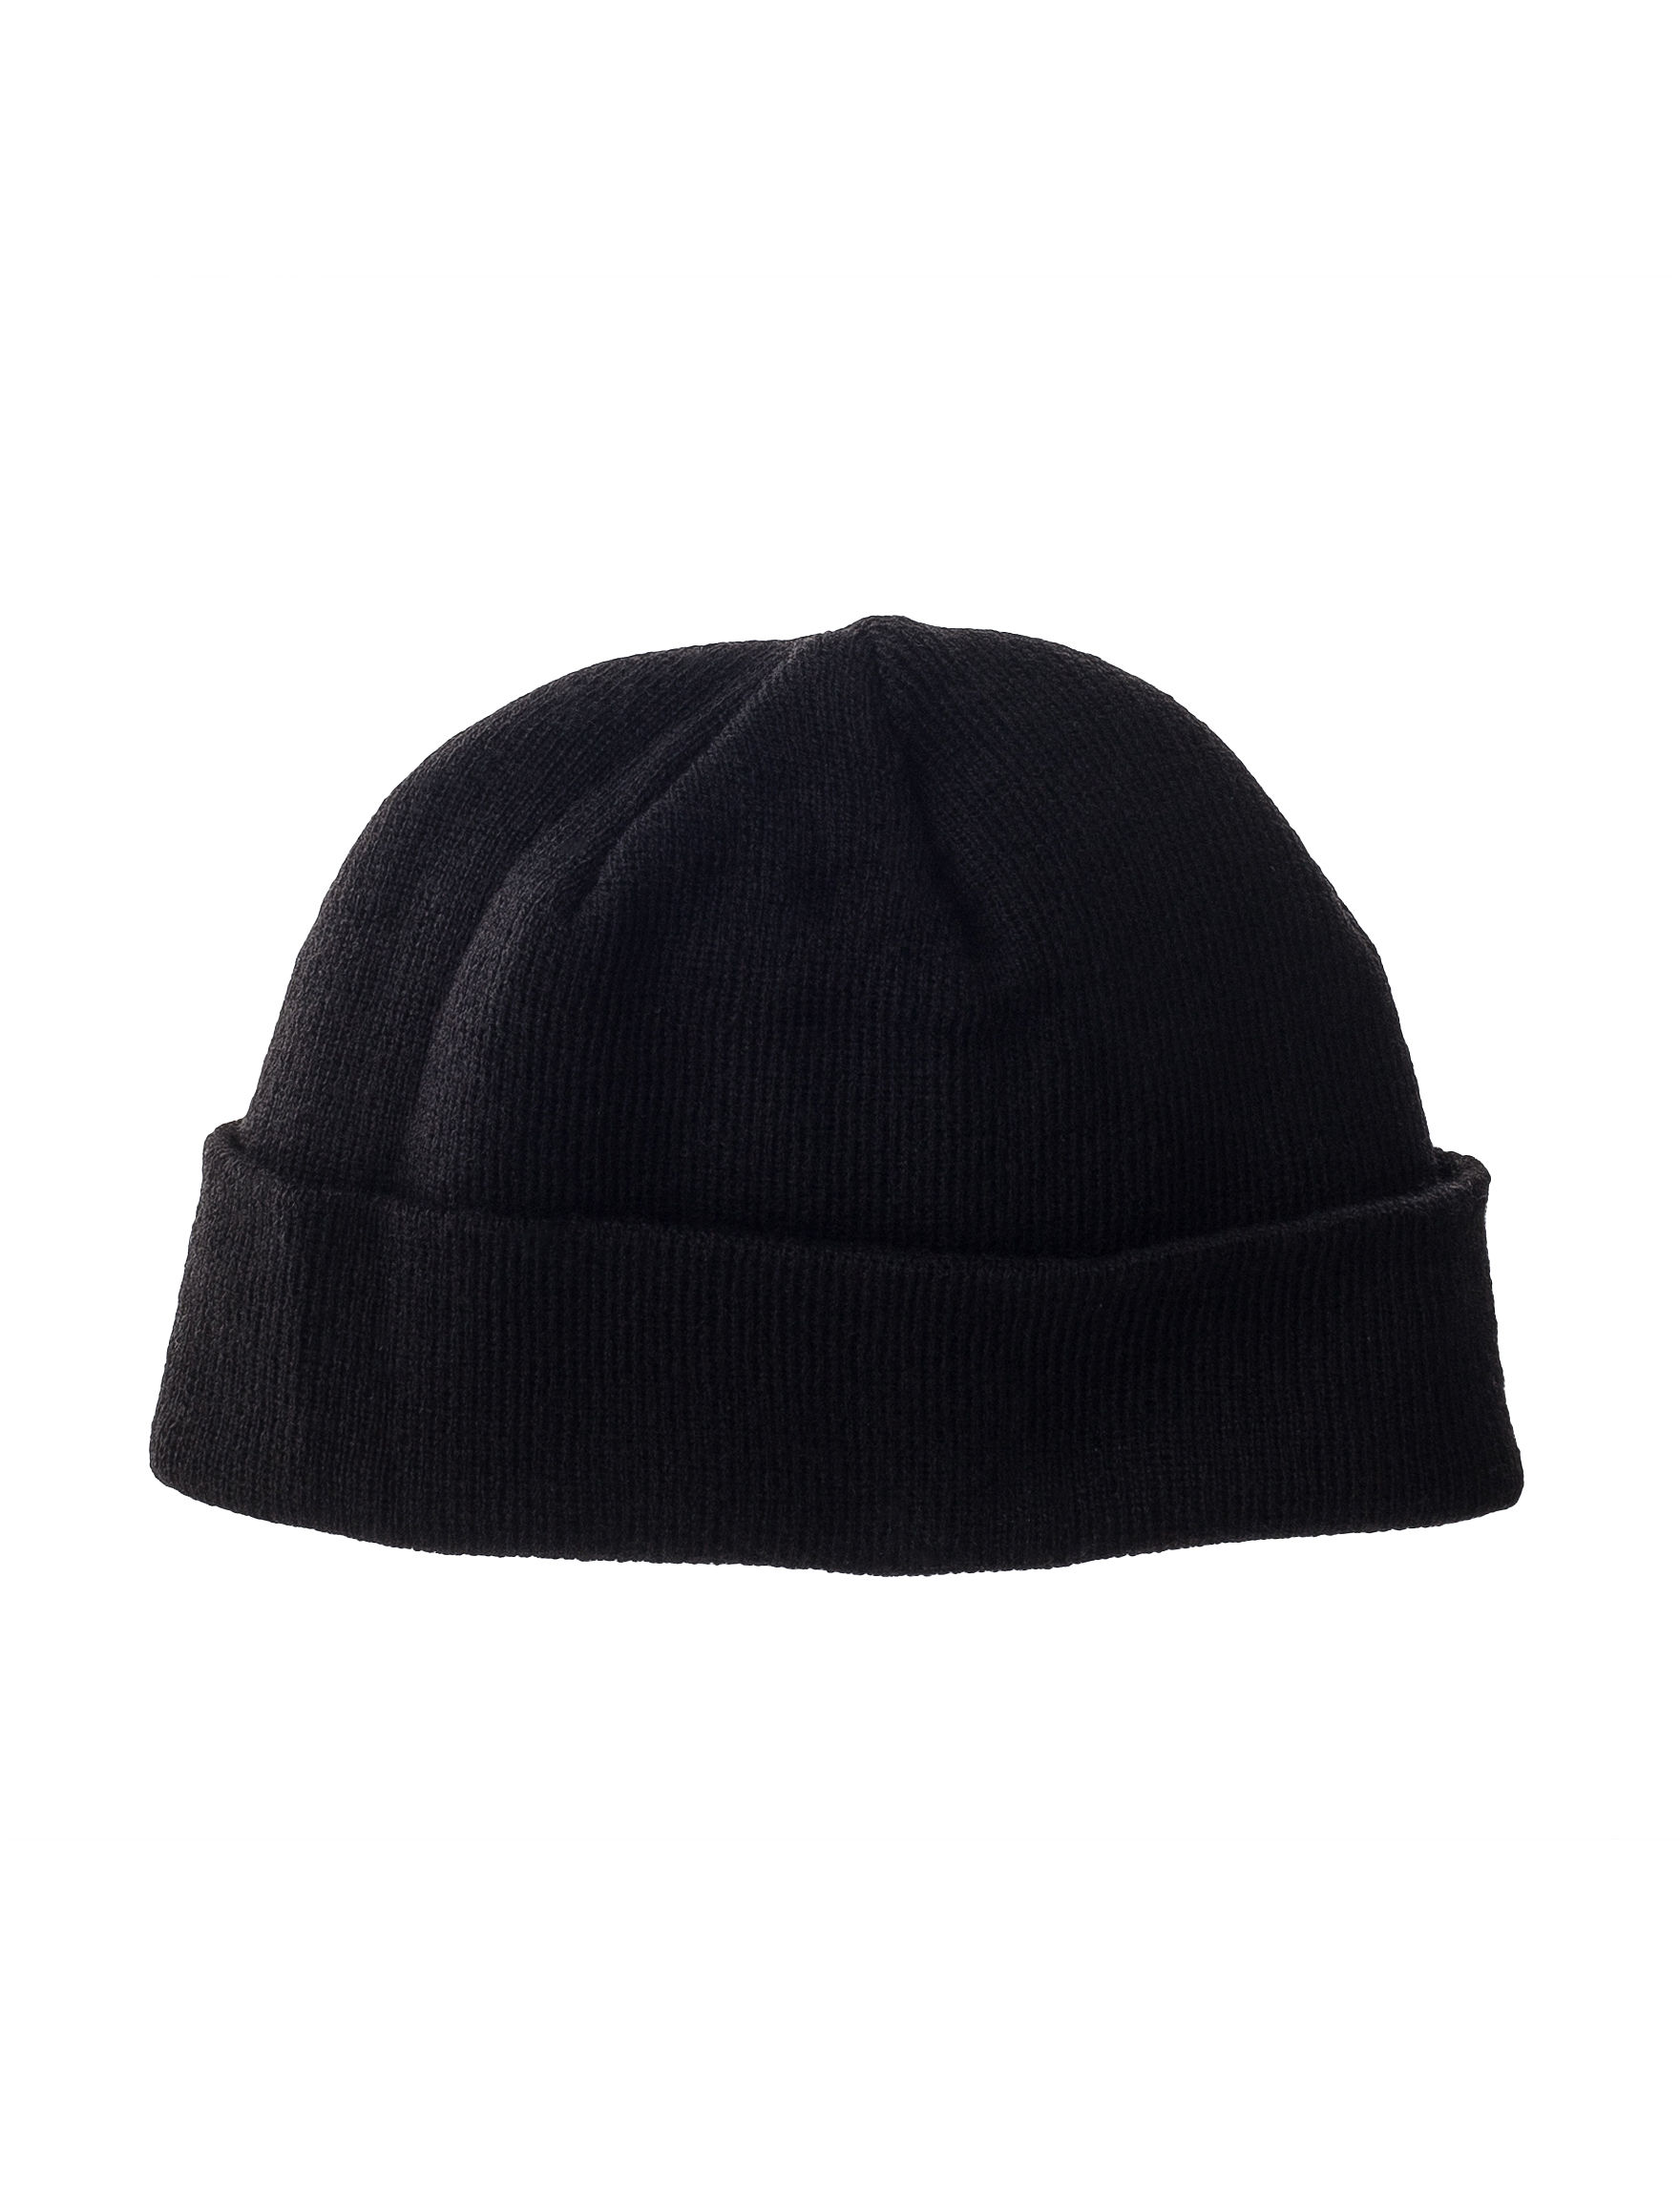 Ivy Crew Black Hats & Headwear